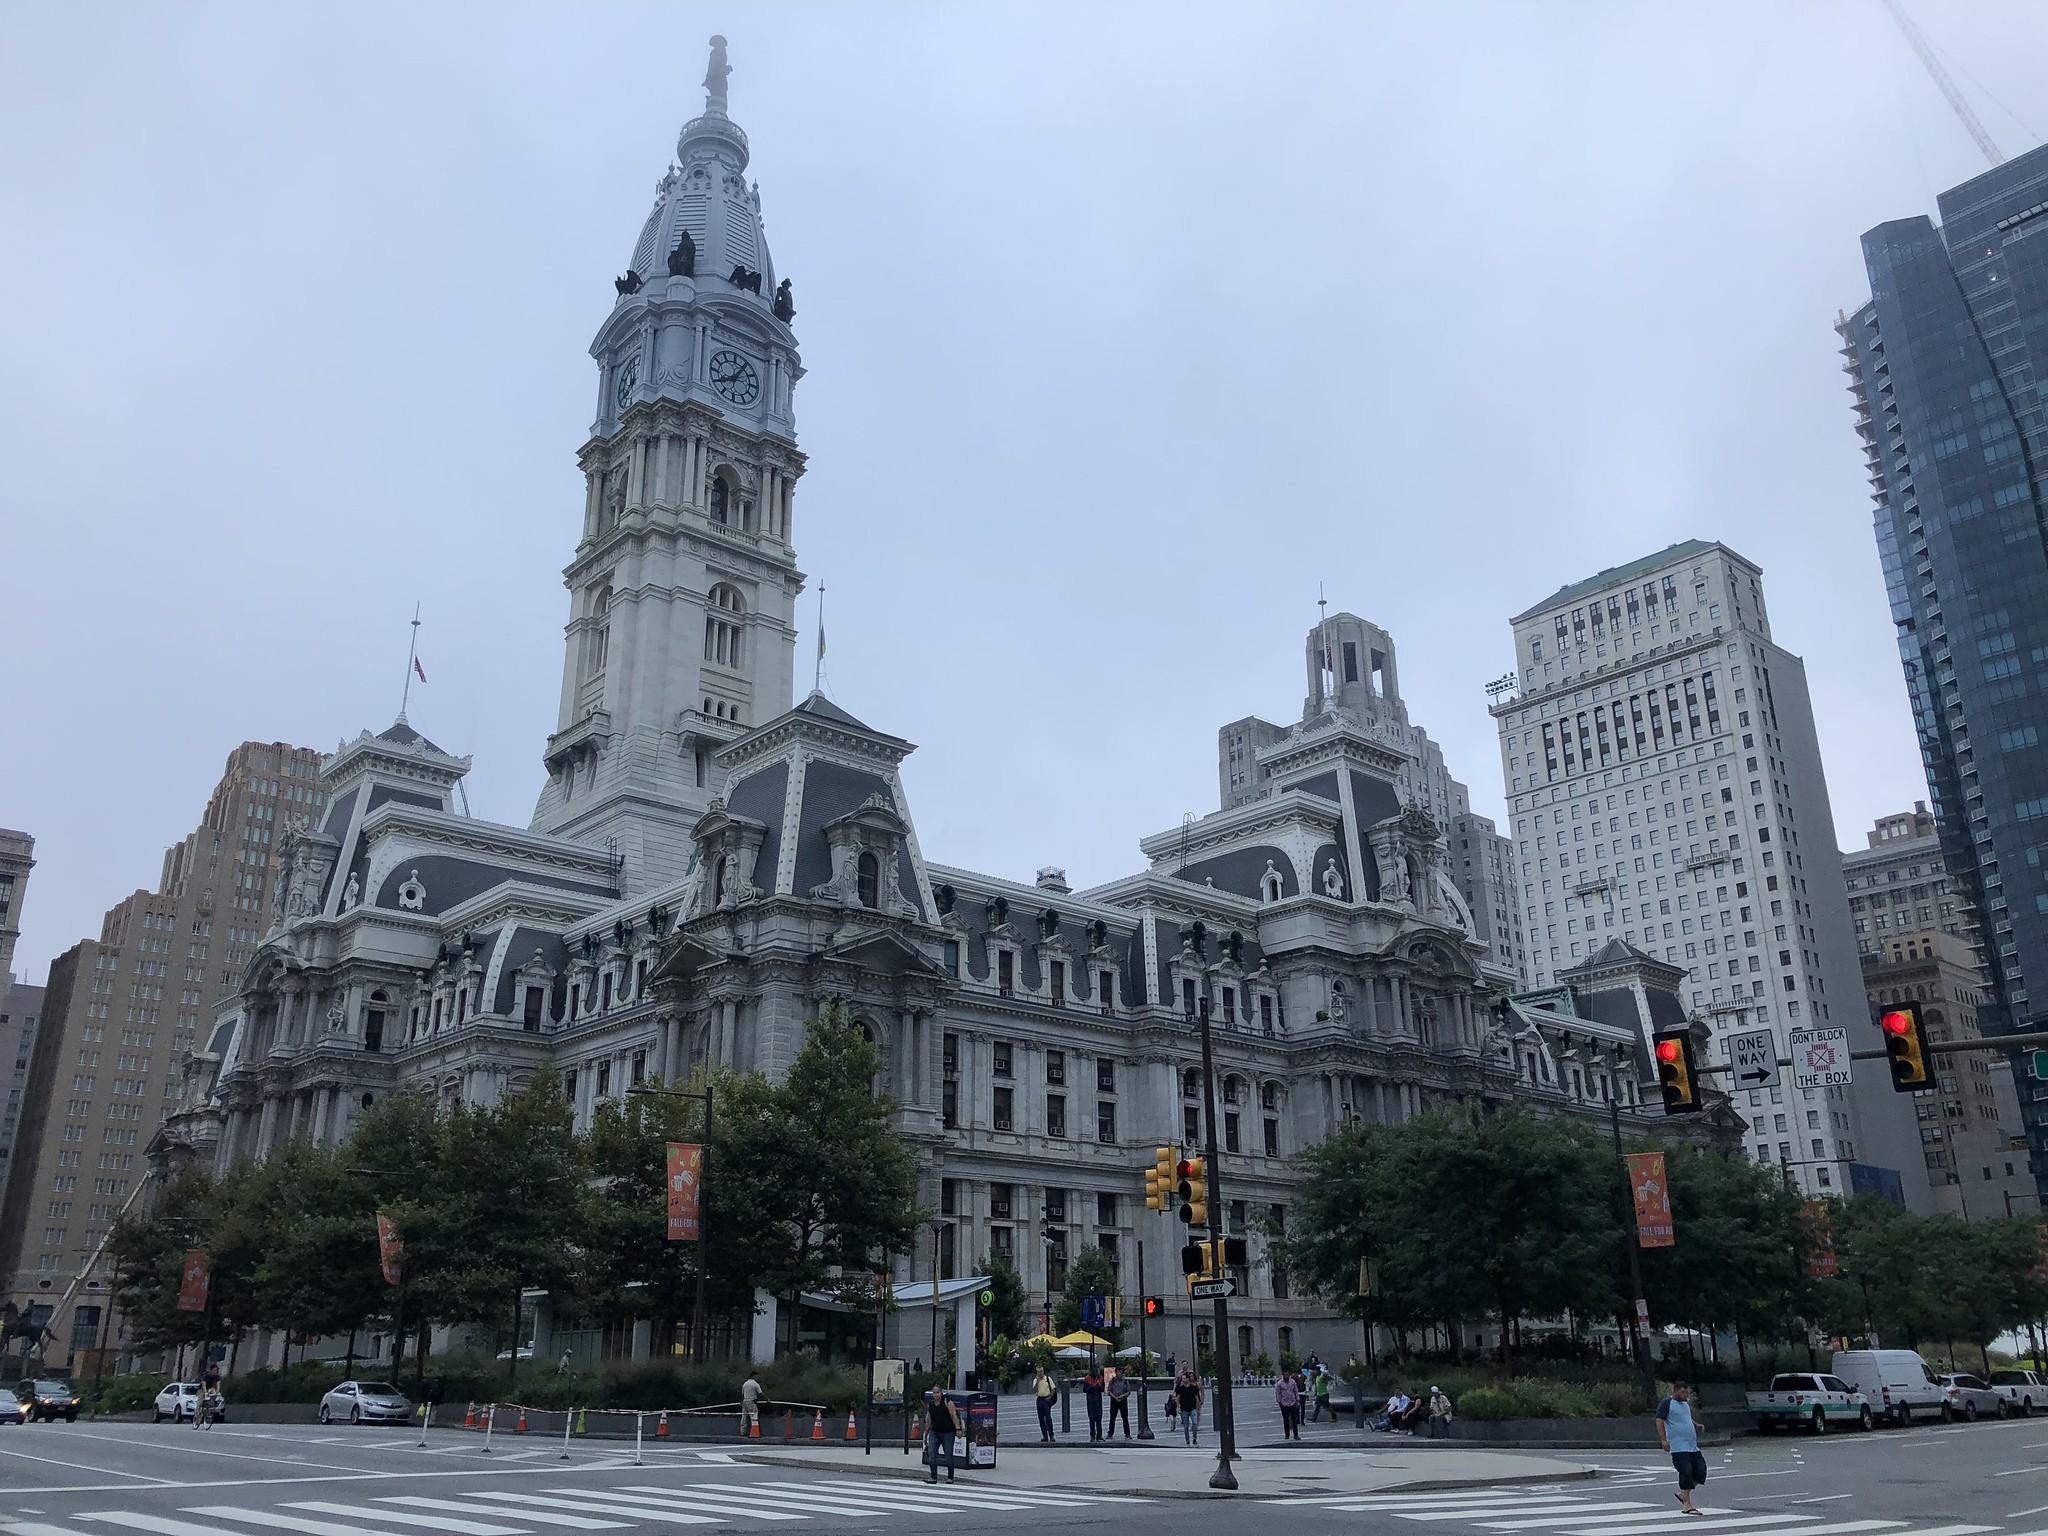 X: City Hall